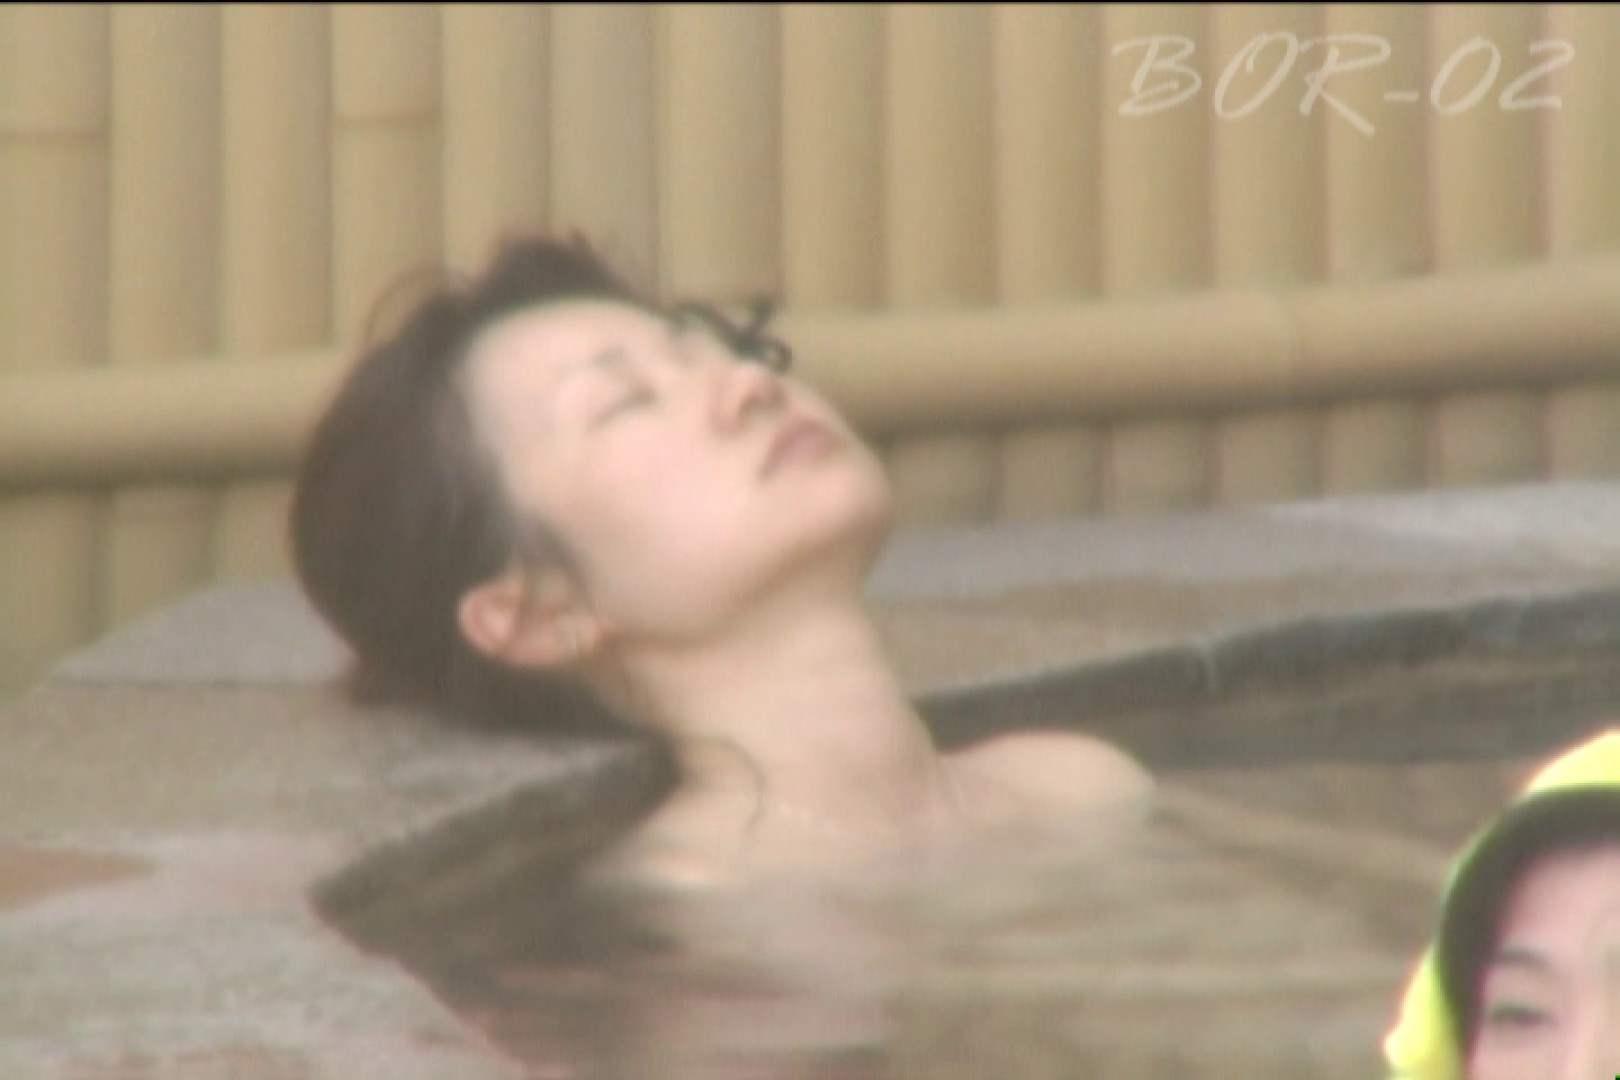 Aquaな露天風呂Vol.477 0 | 0  28連発 11